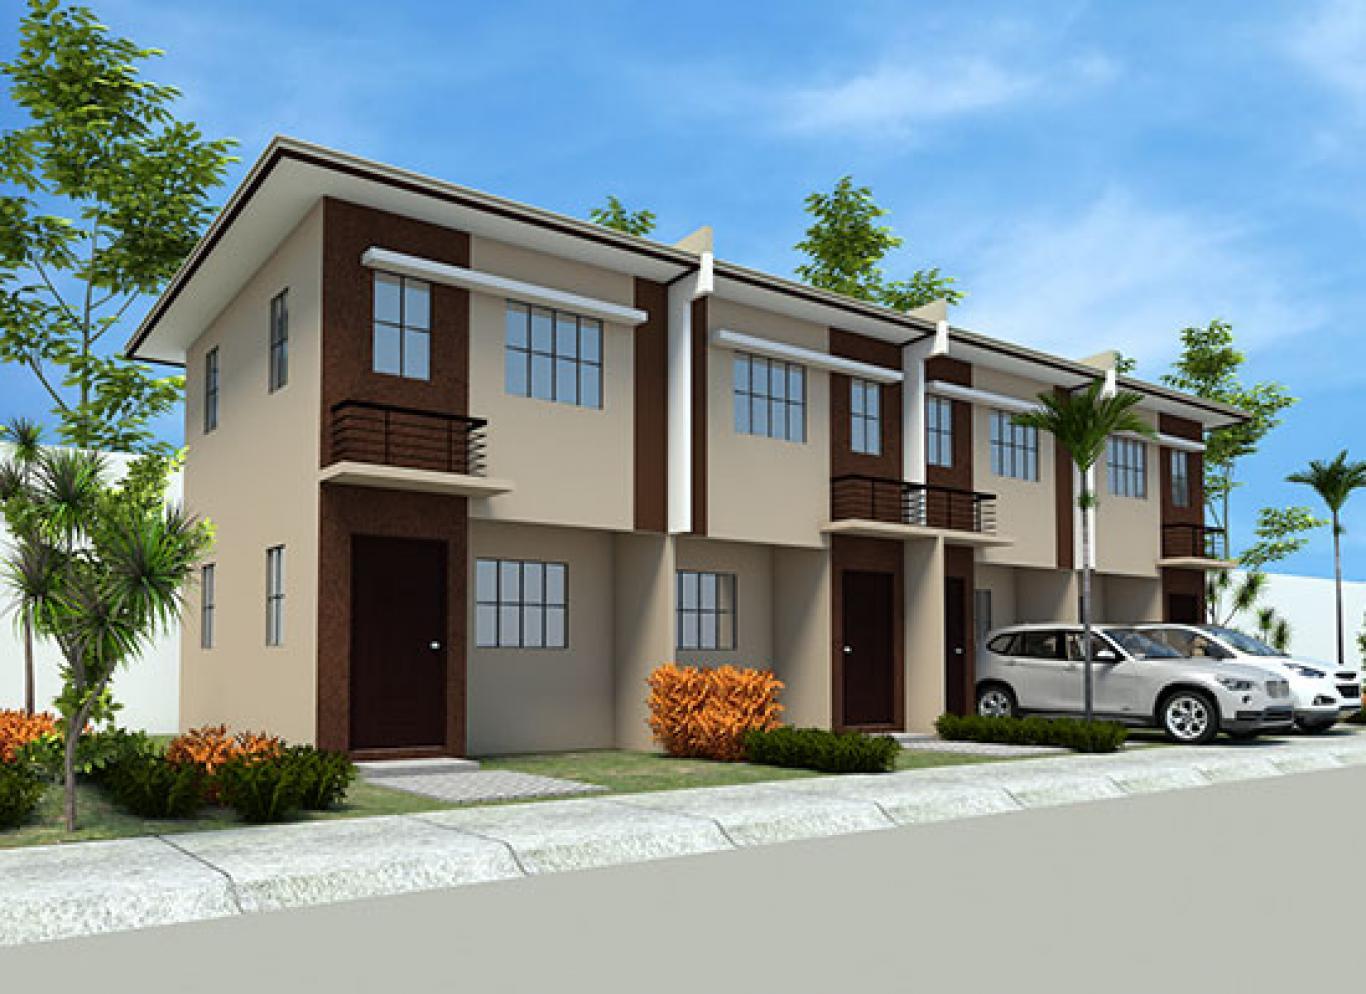 Angeli House Model